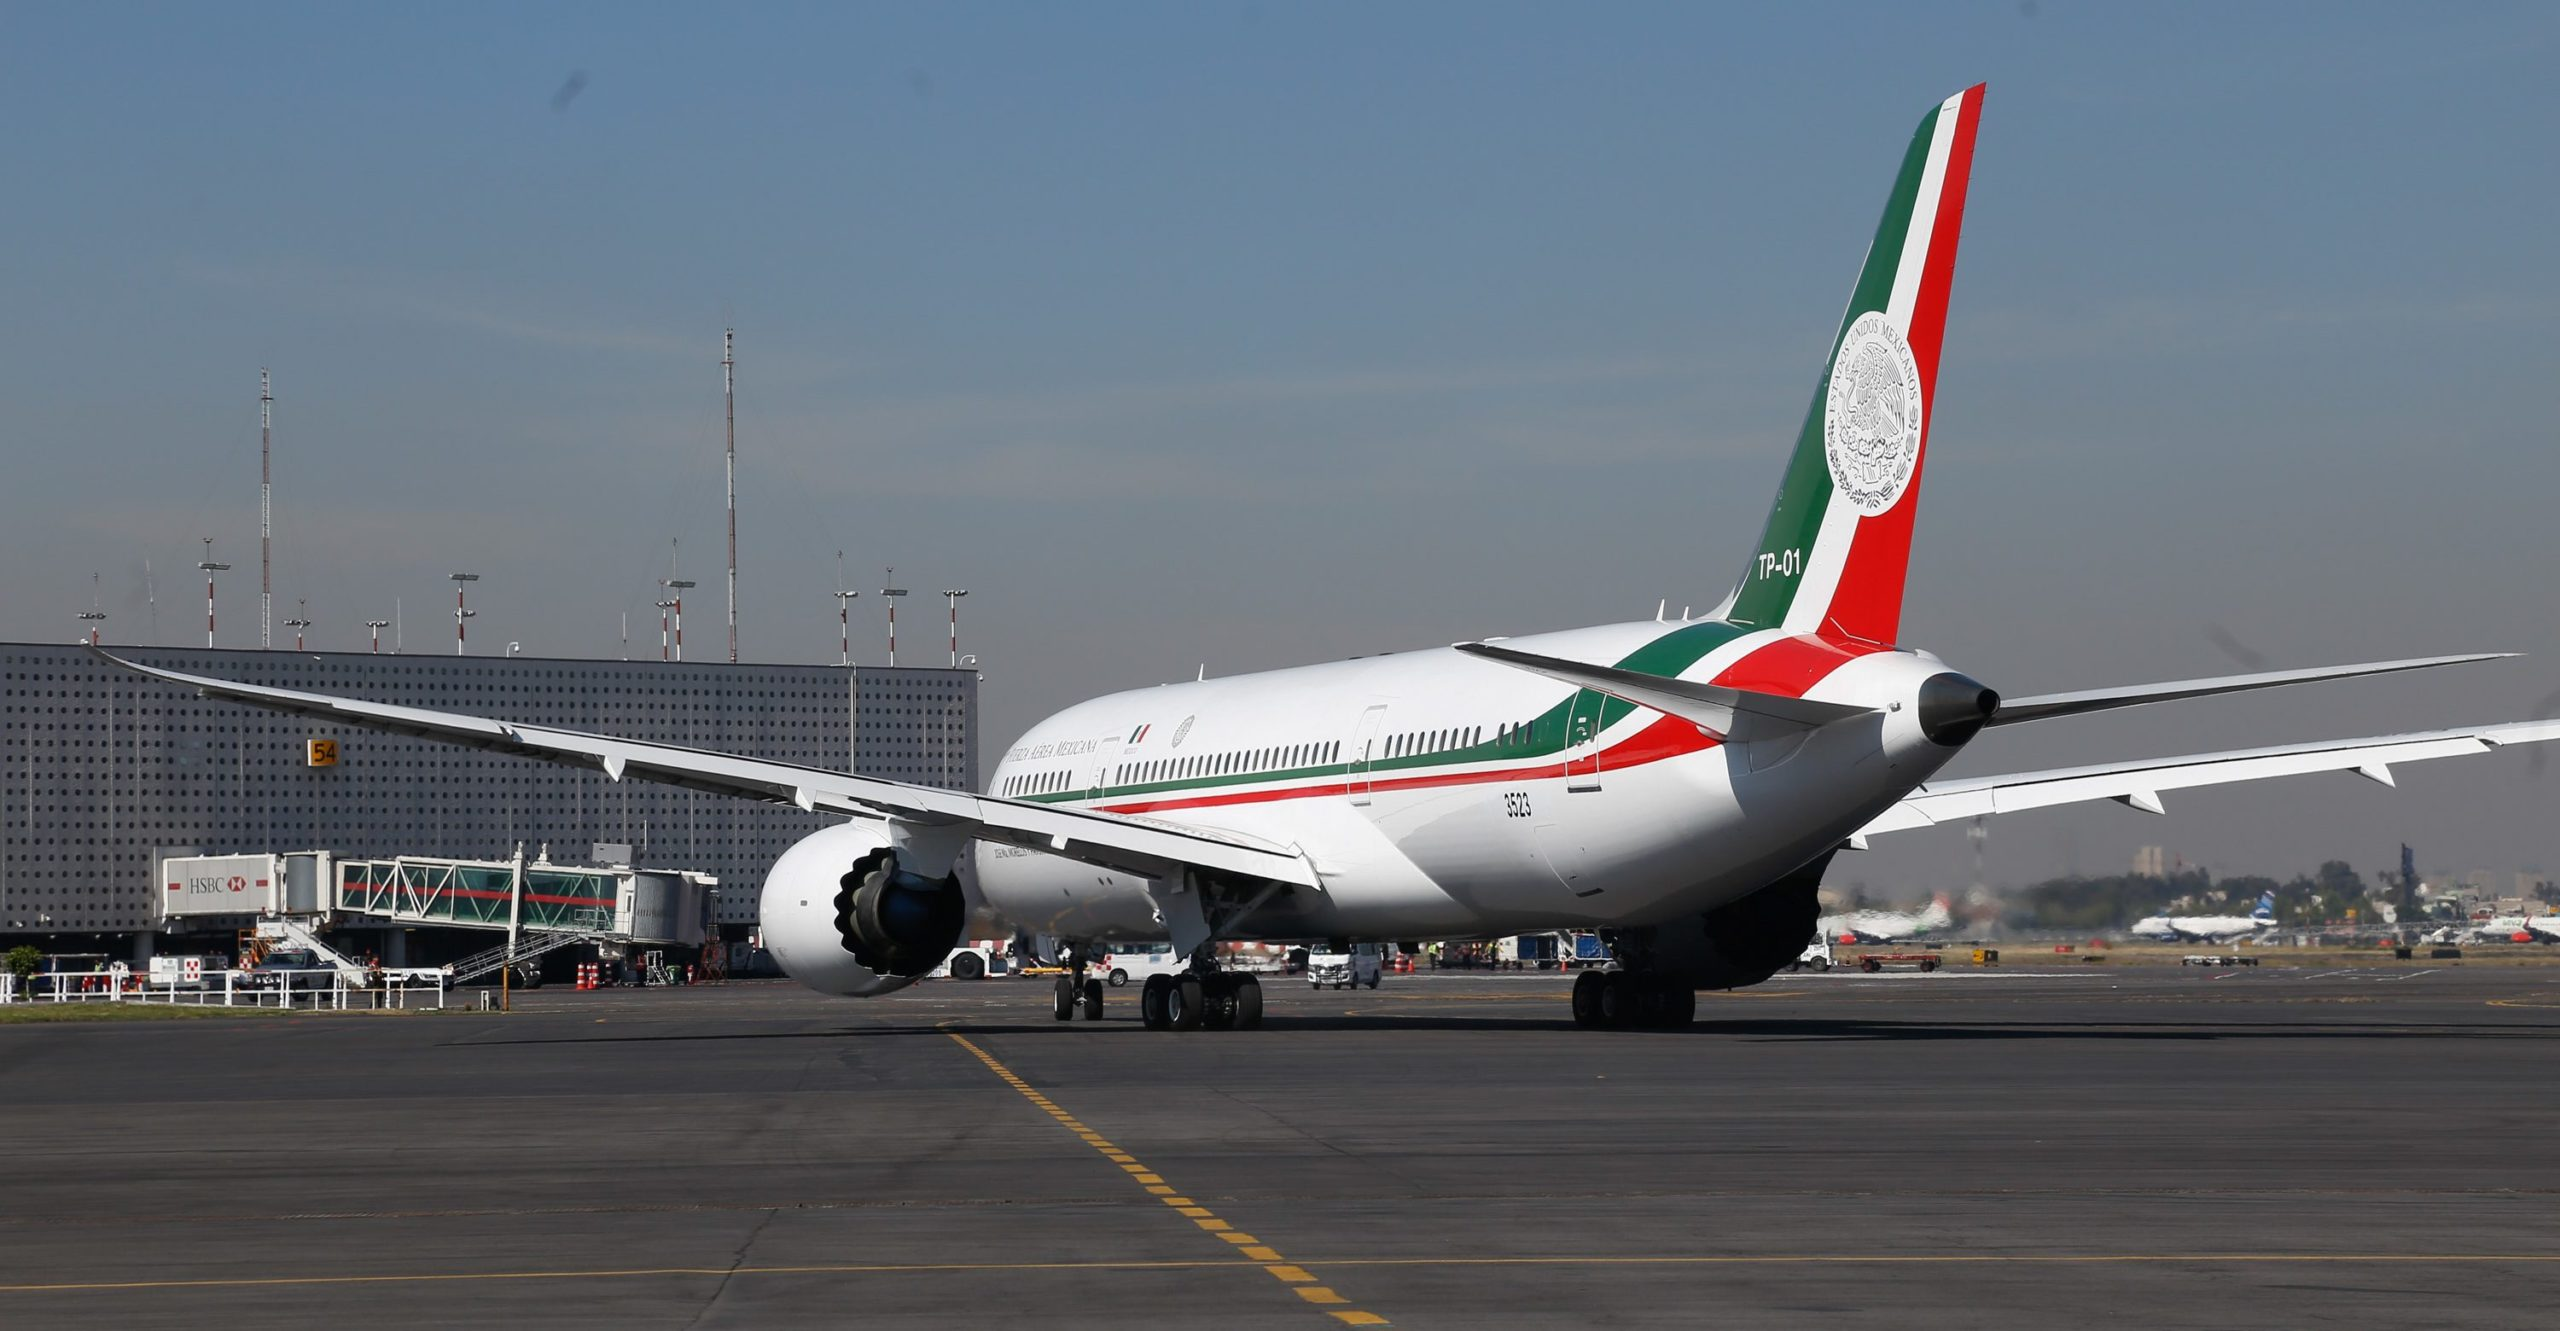 Avión-Presidencial-1-scaled-1.jpg